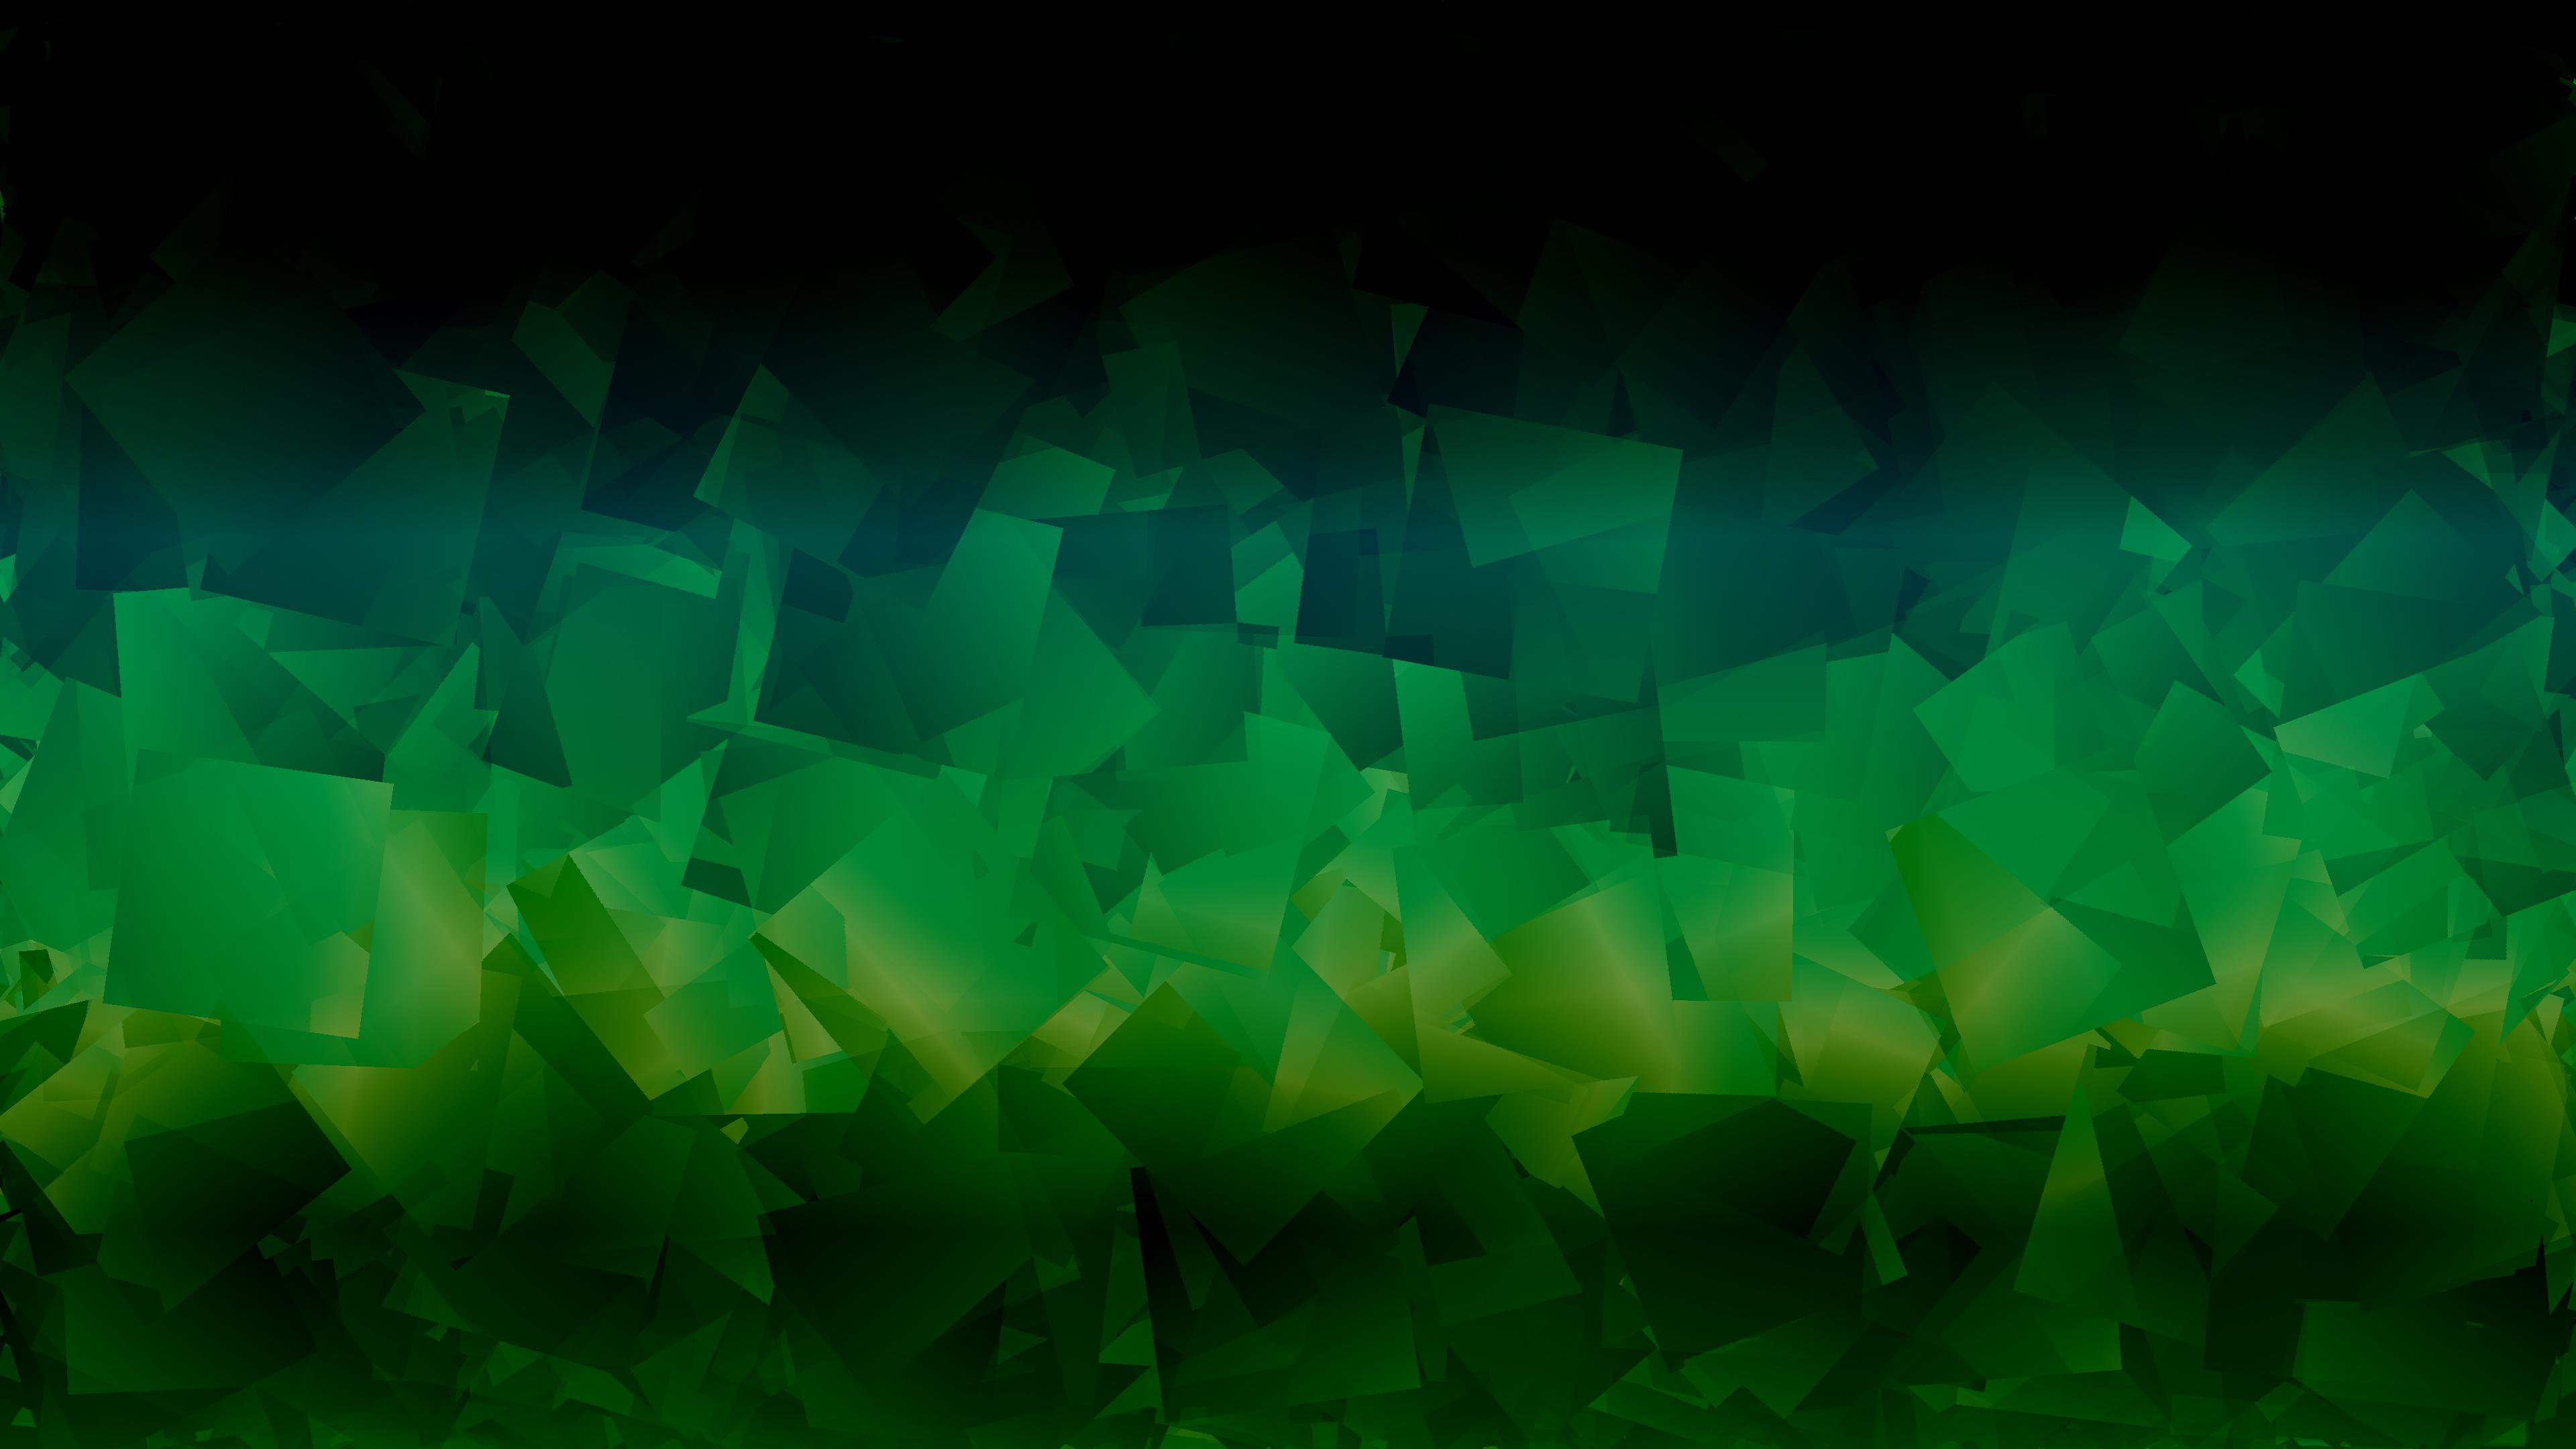 Dark Green Abstract Shapes 4k Hd Abstract 4k Wallpapers